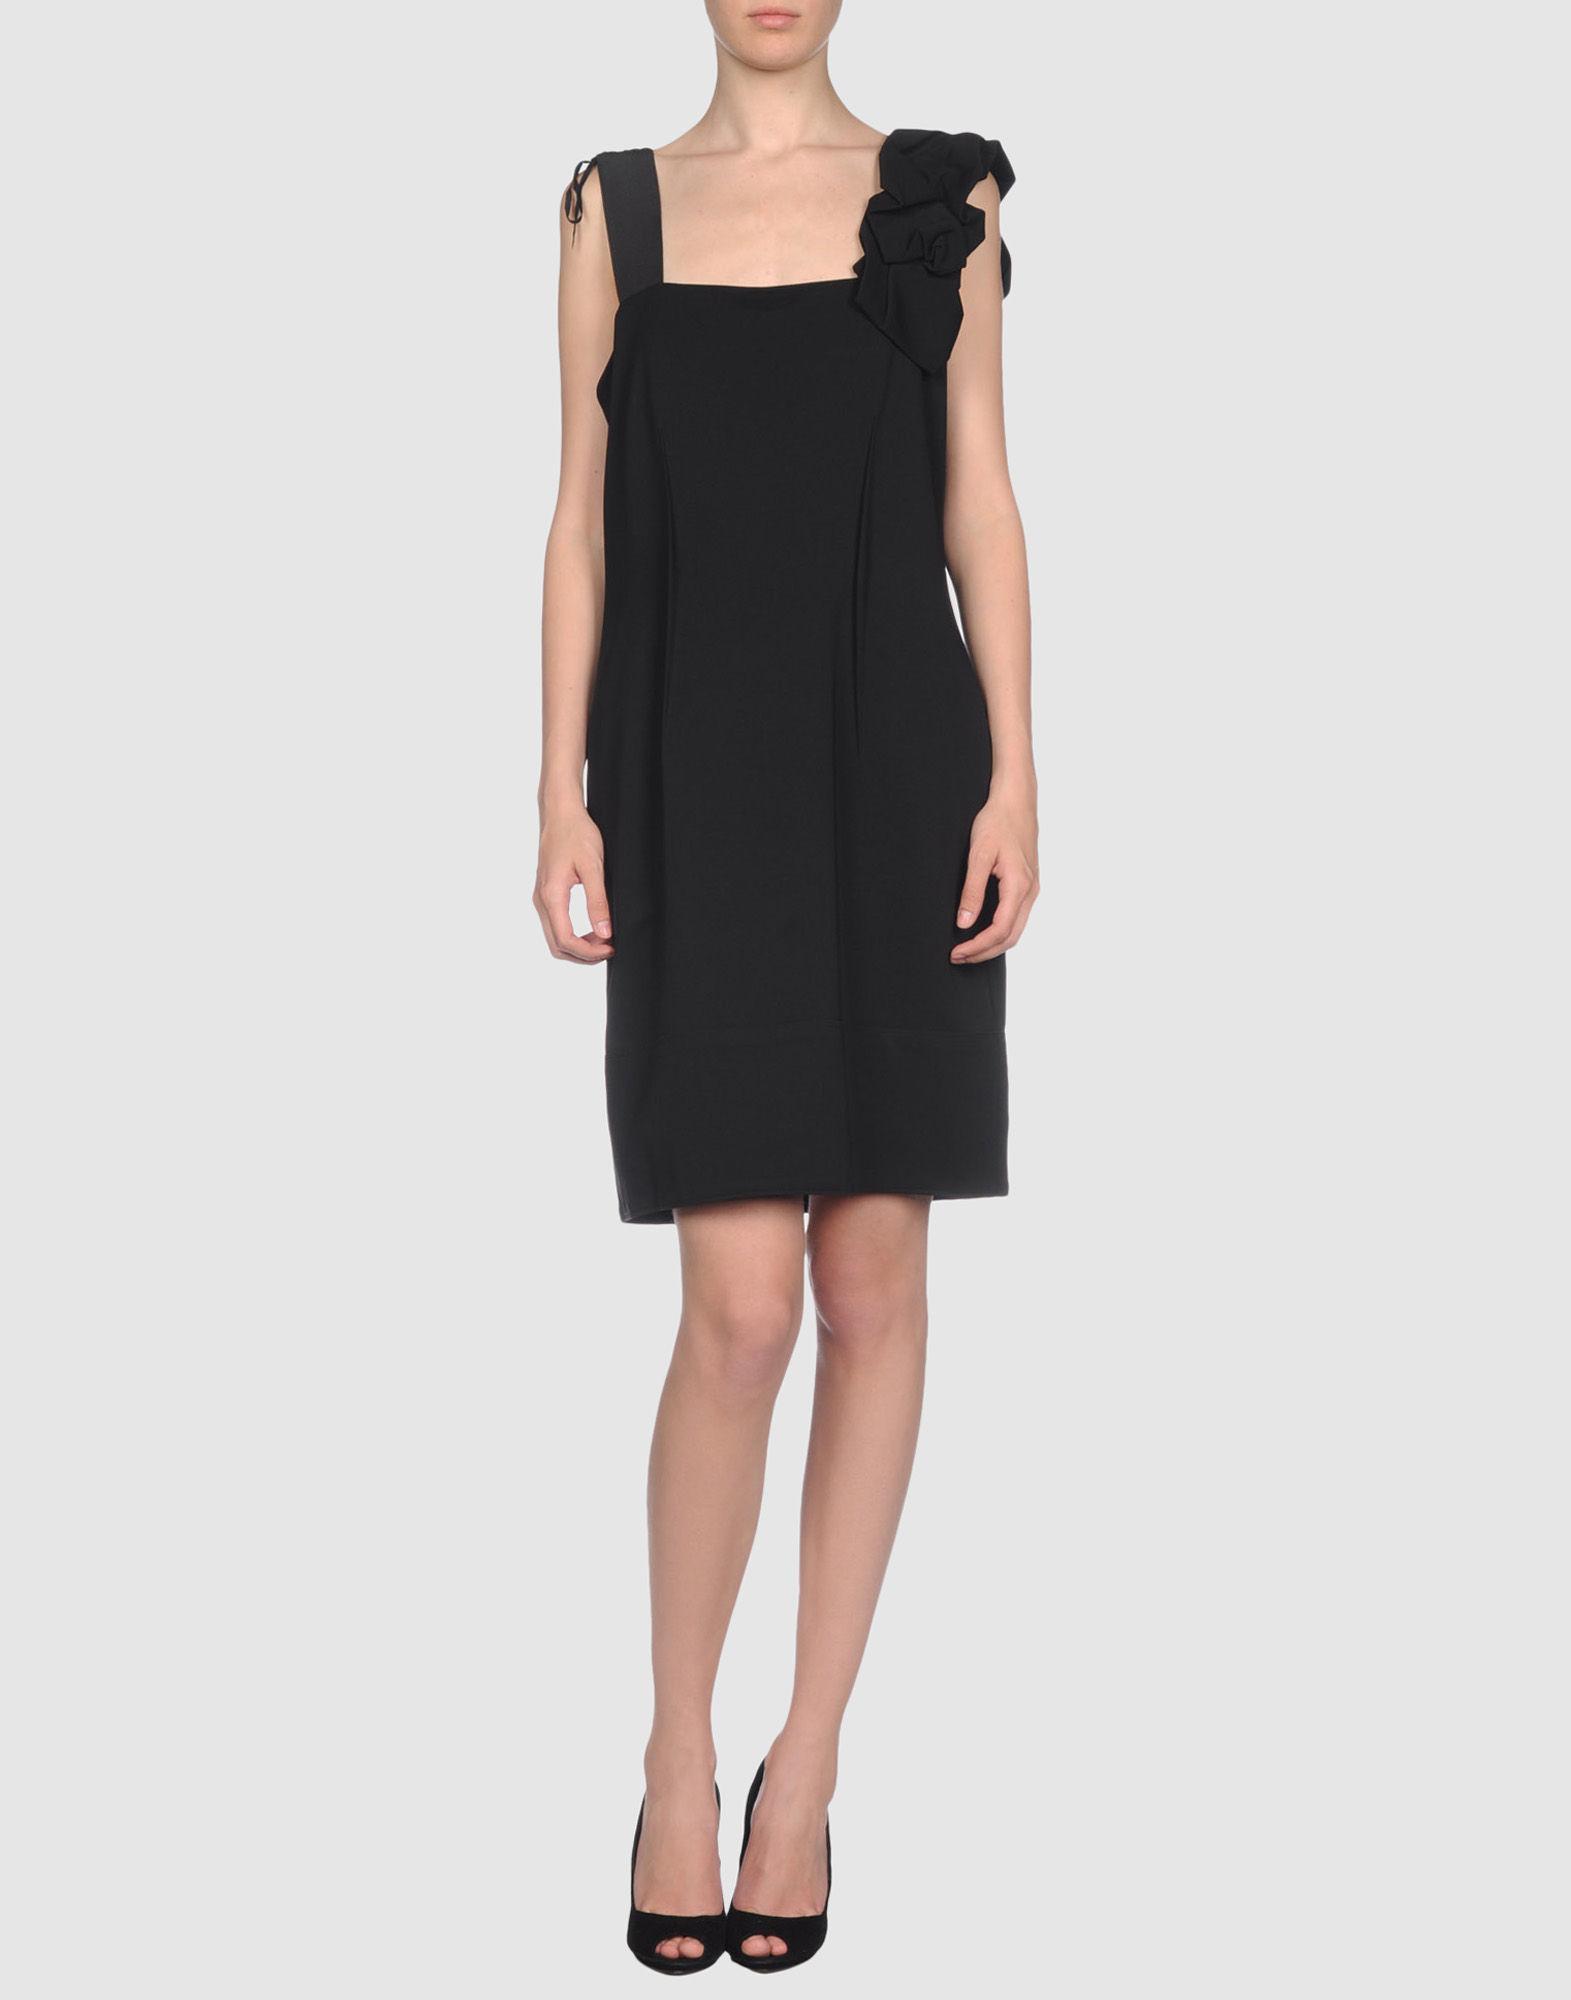 34212491OB 14 f - Evening Φορεματα Vera Wang 2011 2012 Κωδ.14